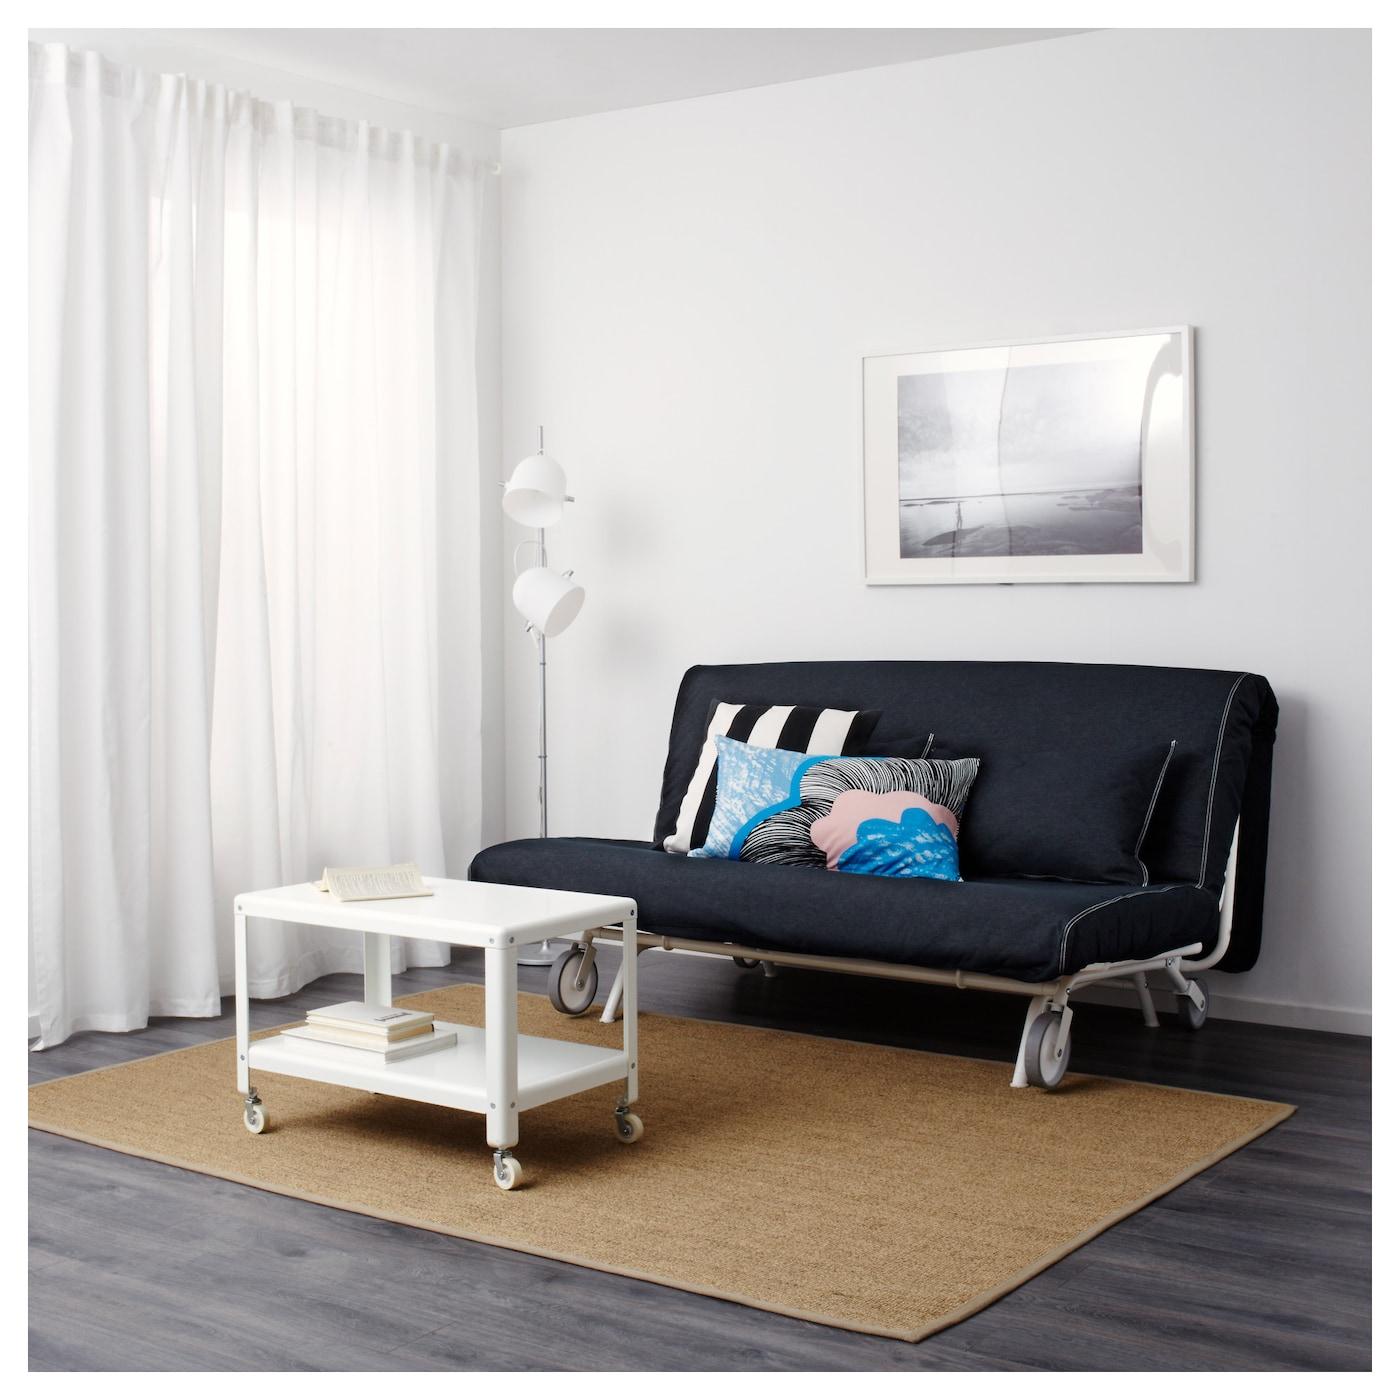 IKEA PS LVS Twoseat sofabed Vansta dark blue IKEA